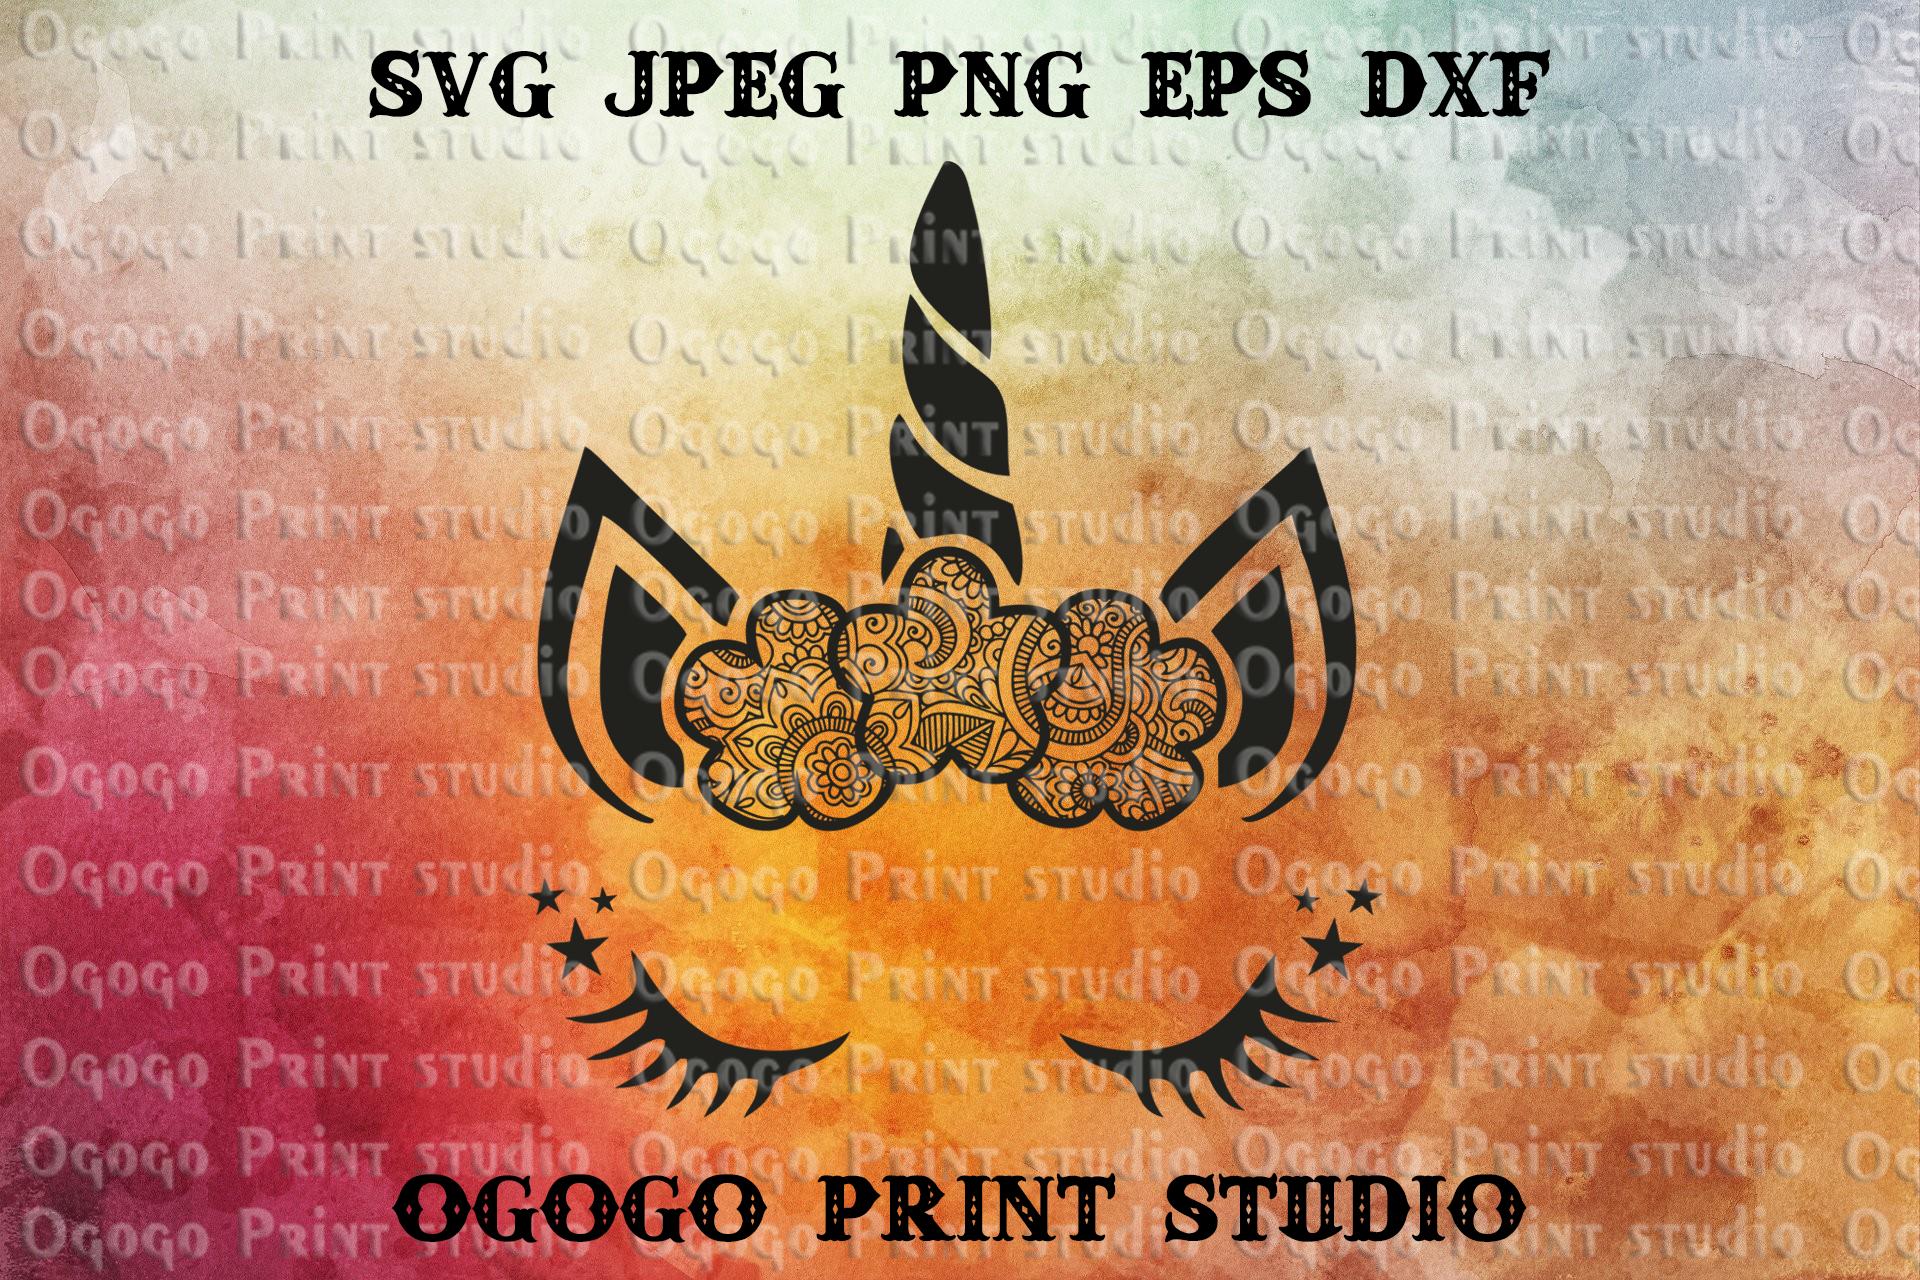 Unicorn SVG, Zentangle SVG, Animal svg, Mandala svg, Cricut example image 1